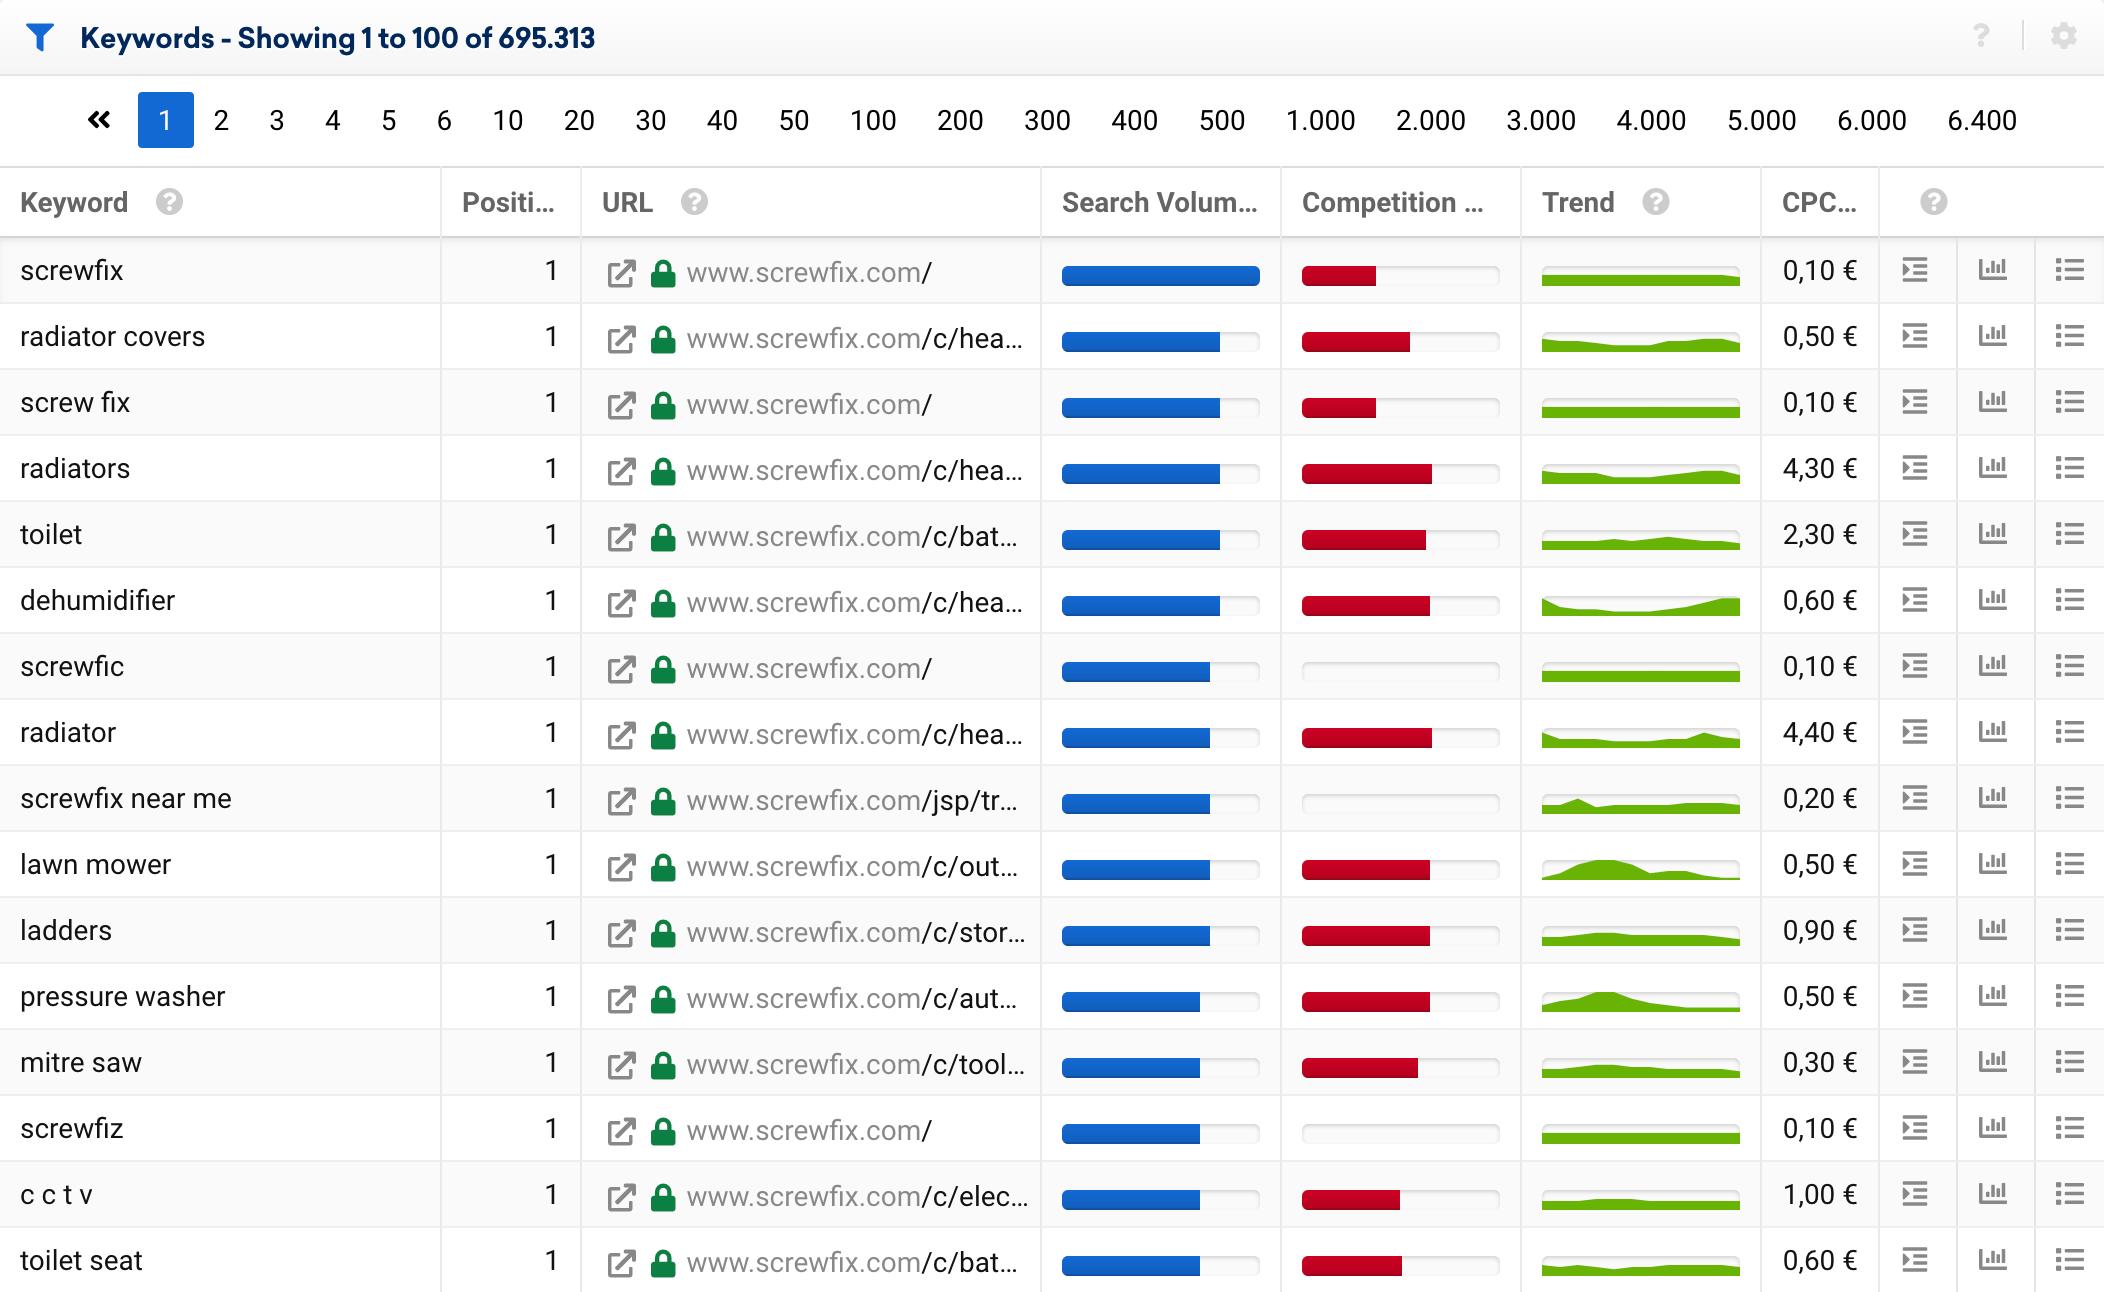 Example of ranking keyword data